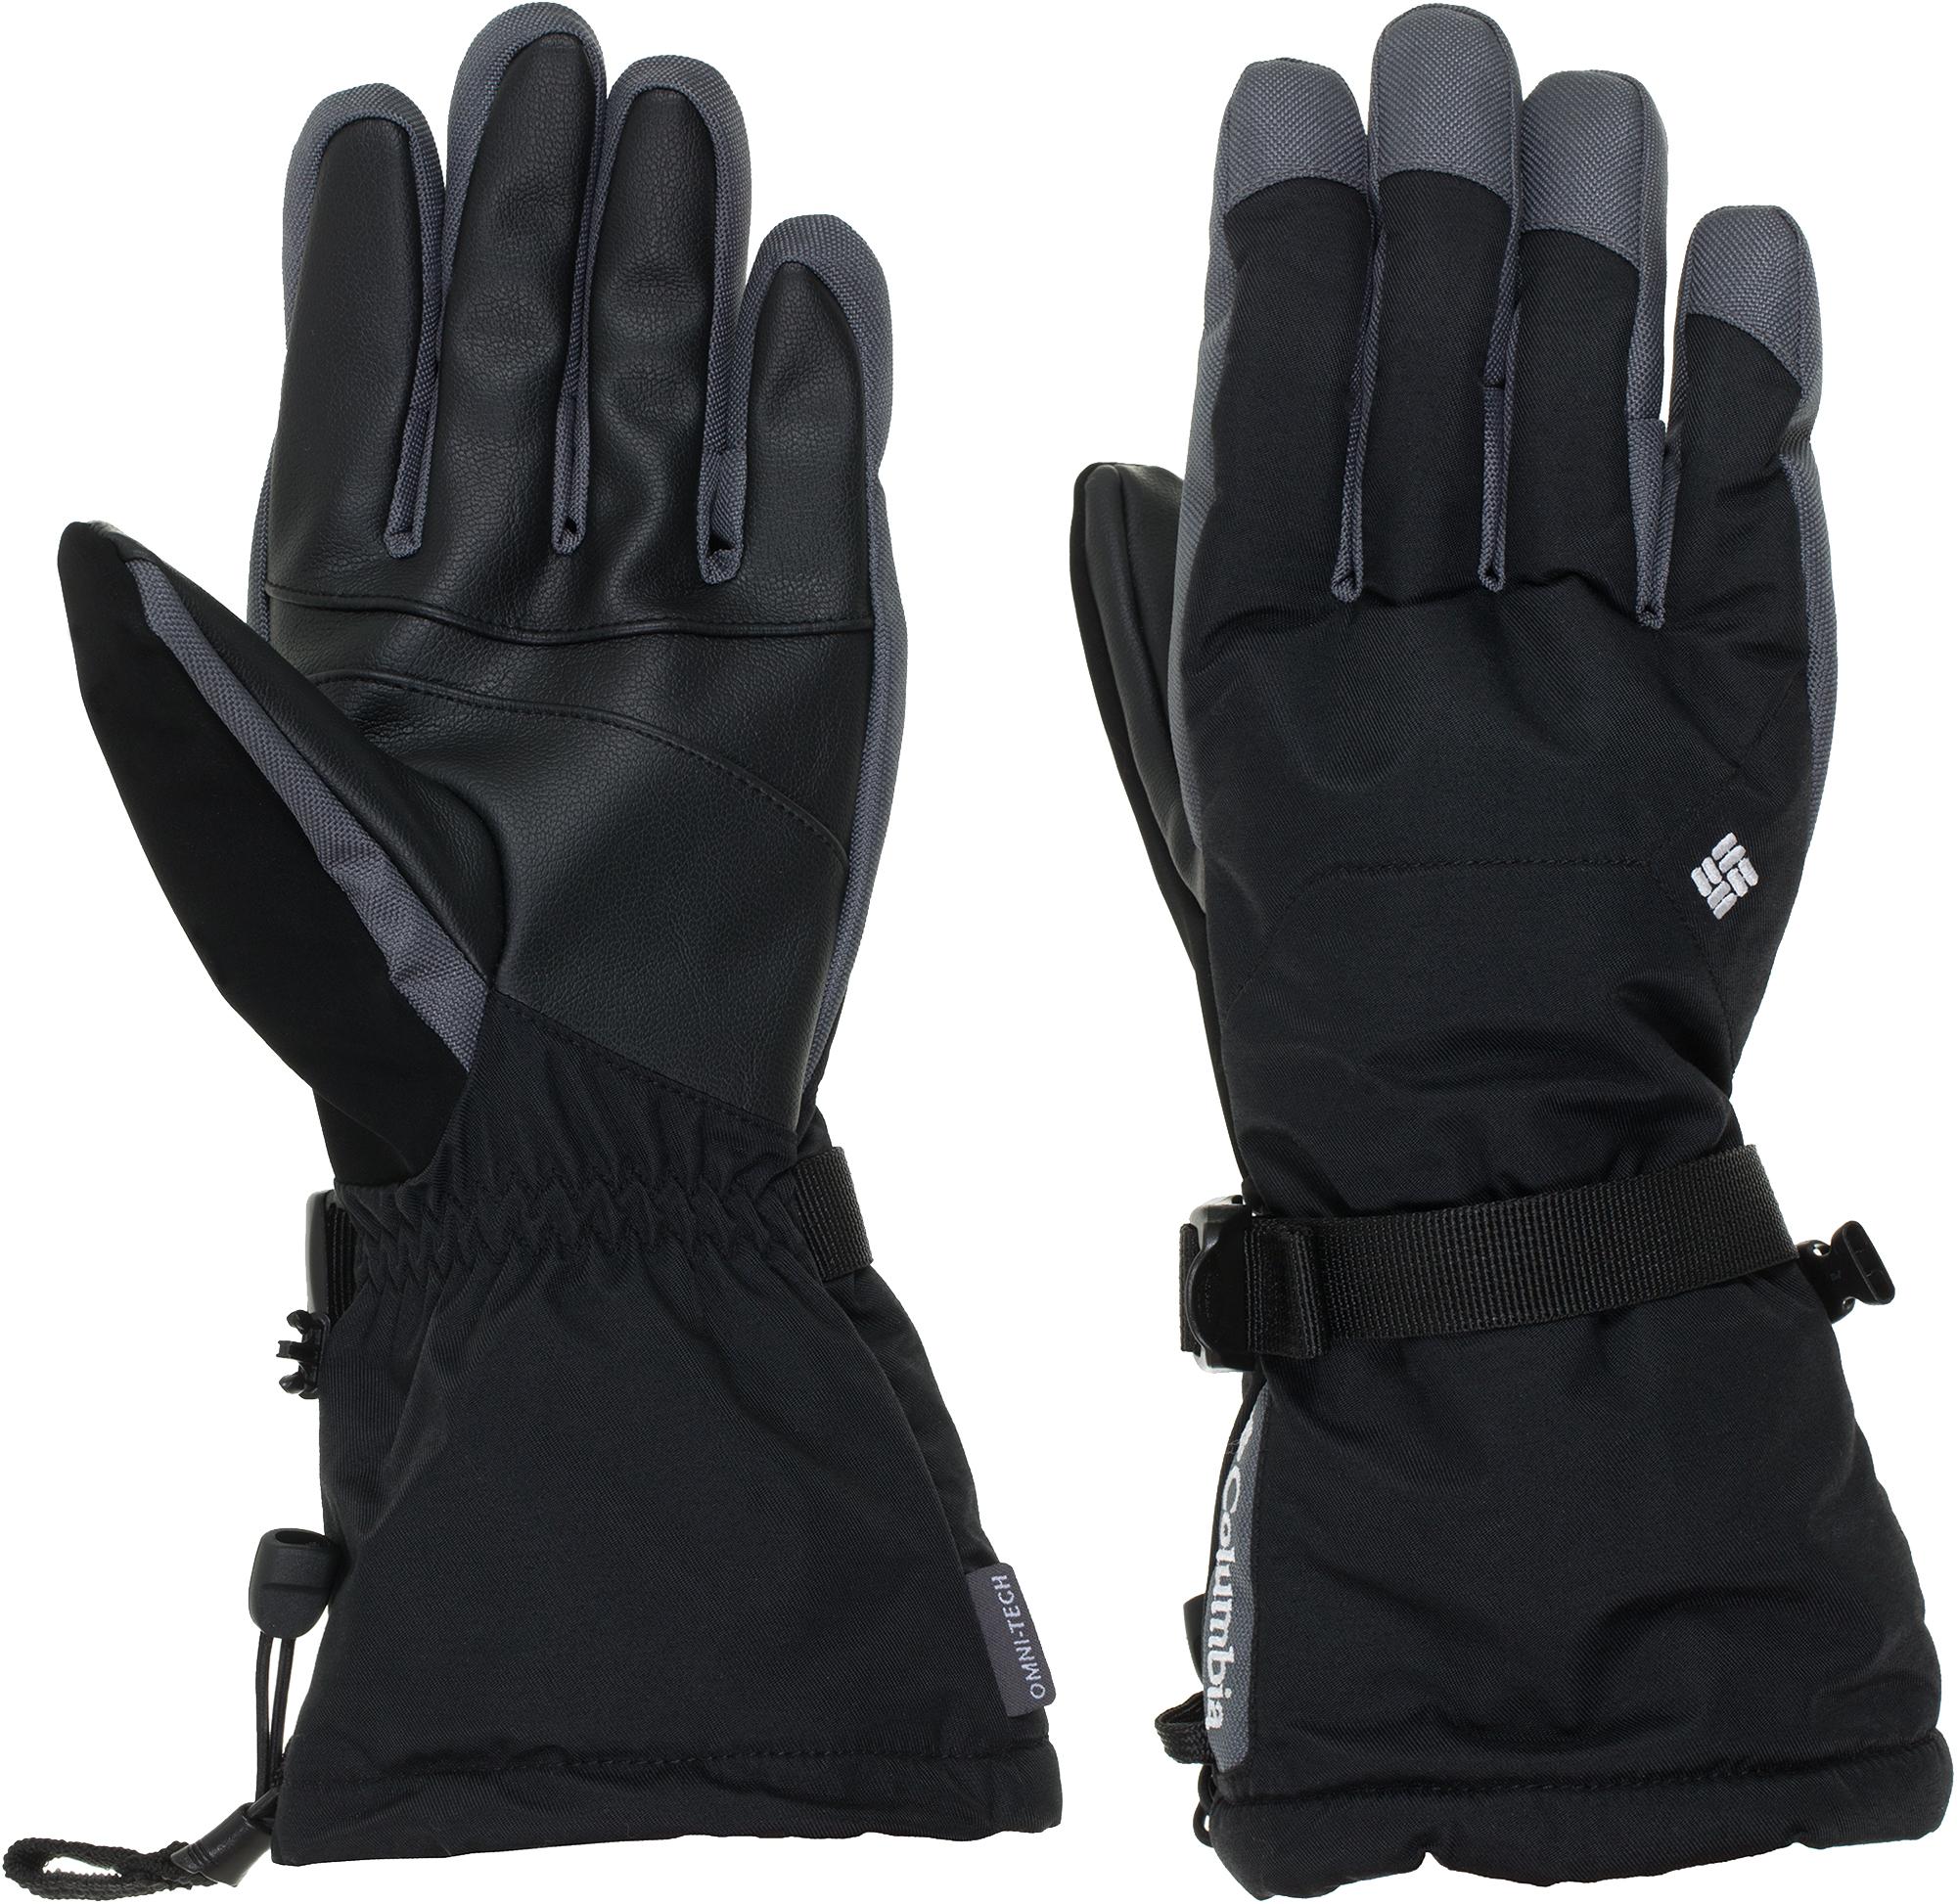 Columbia Перчатки мужские Columbia Whirlibir, размер 9 перчатки jetasafety jle021 9 l12